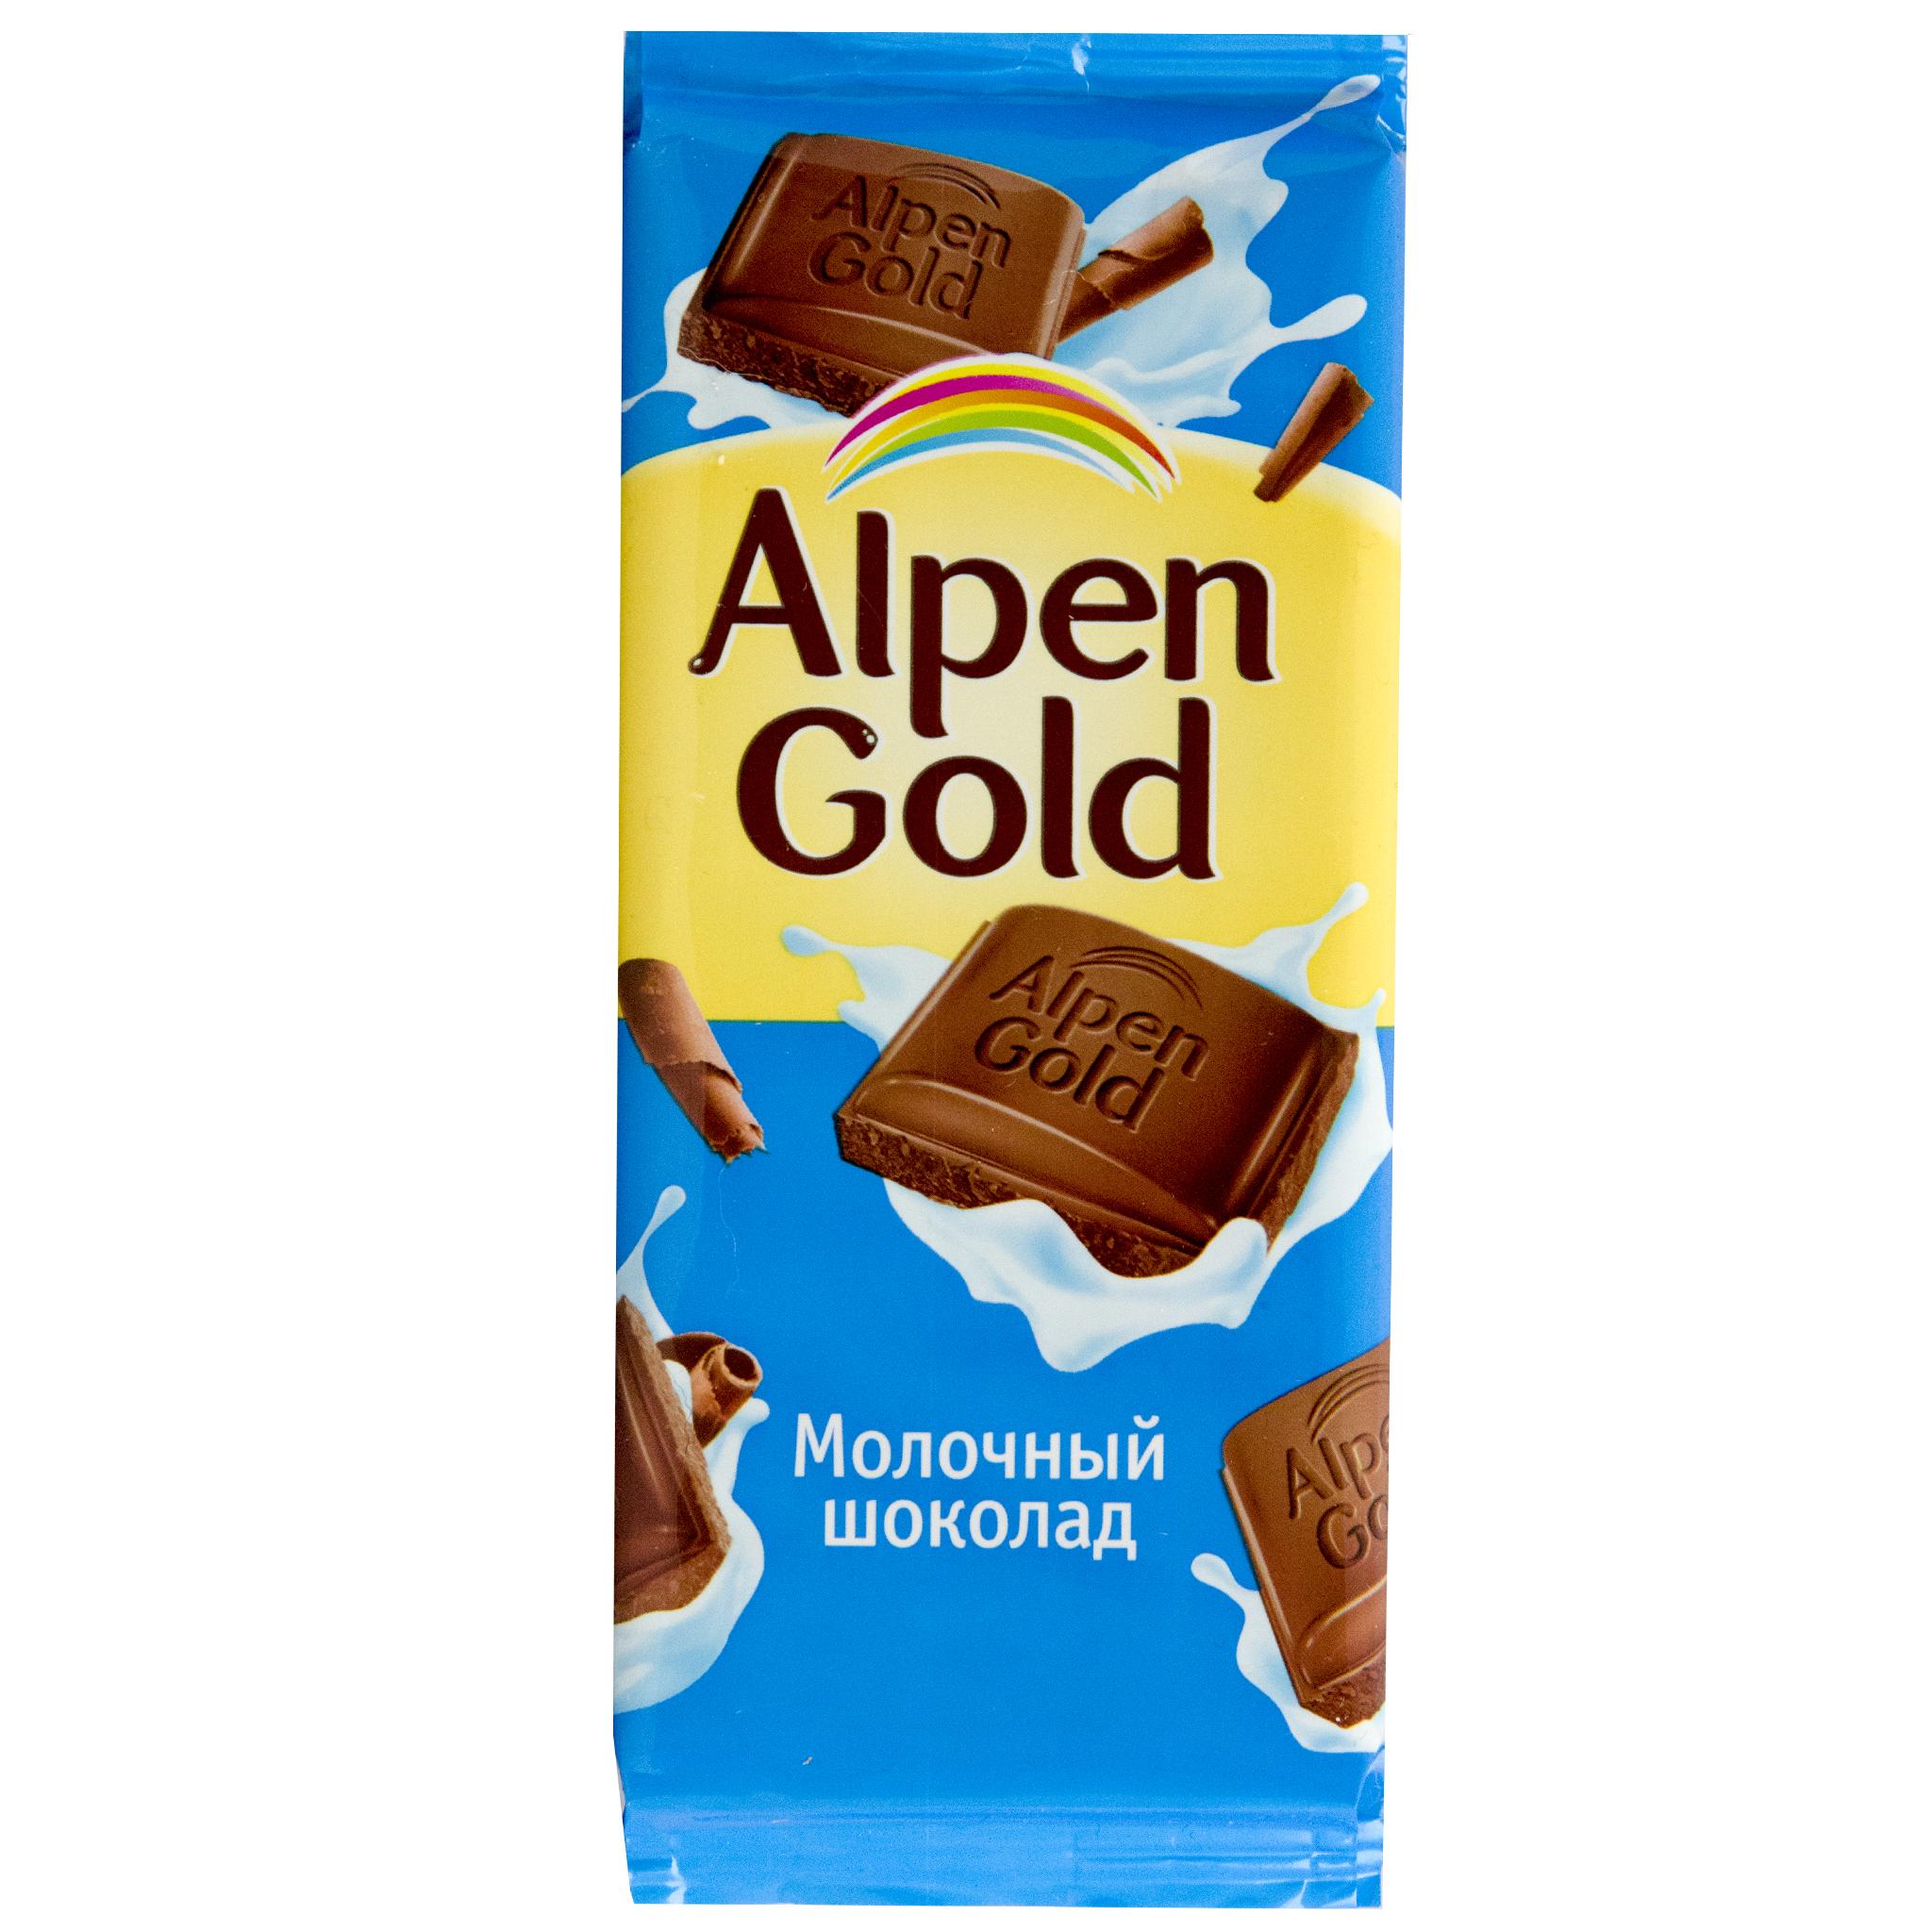 шоколад картинки алпен теперь буду только